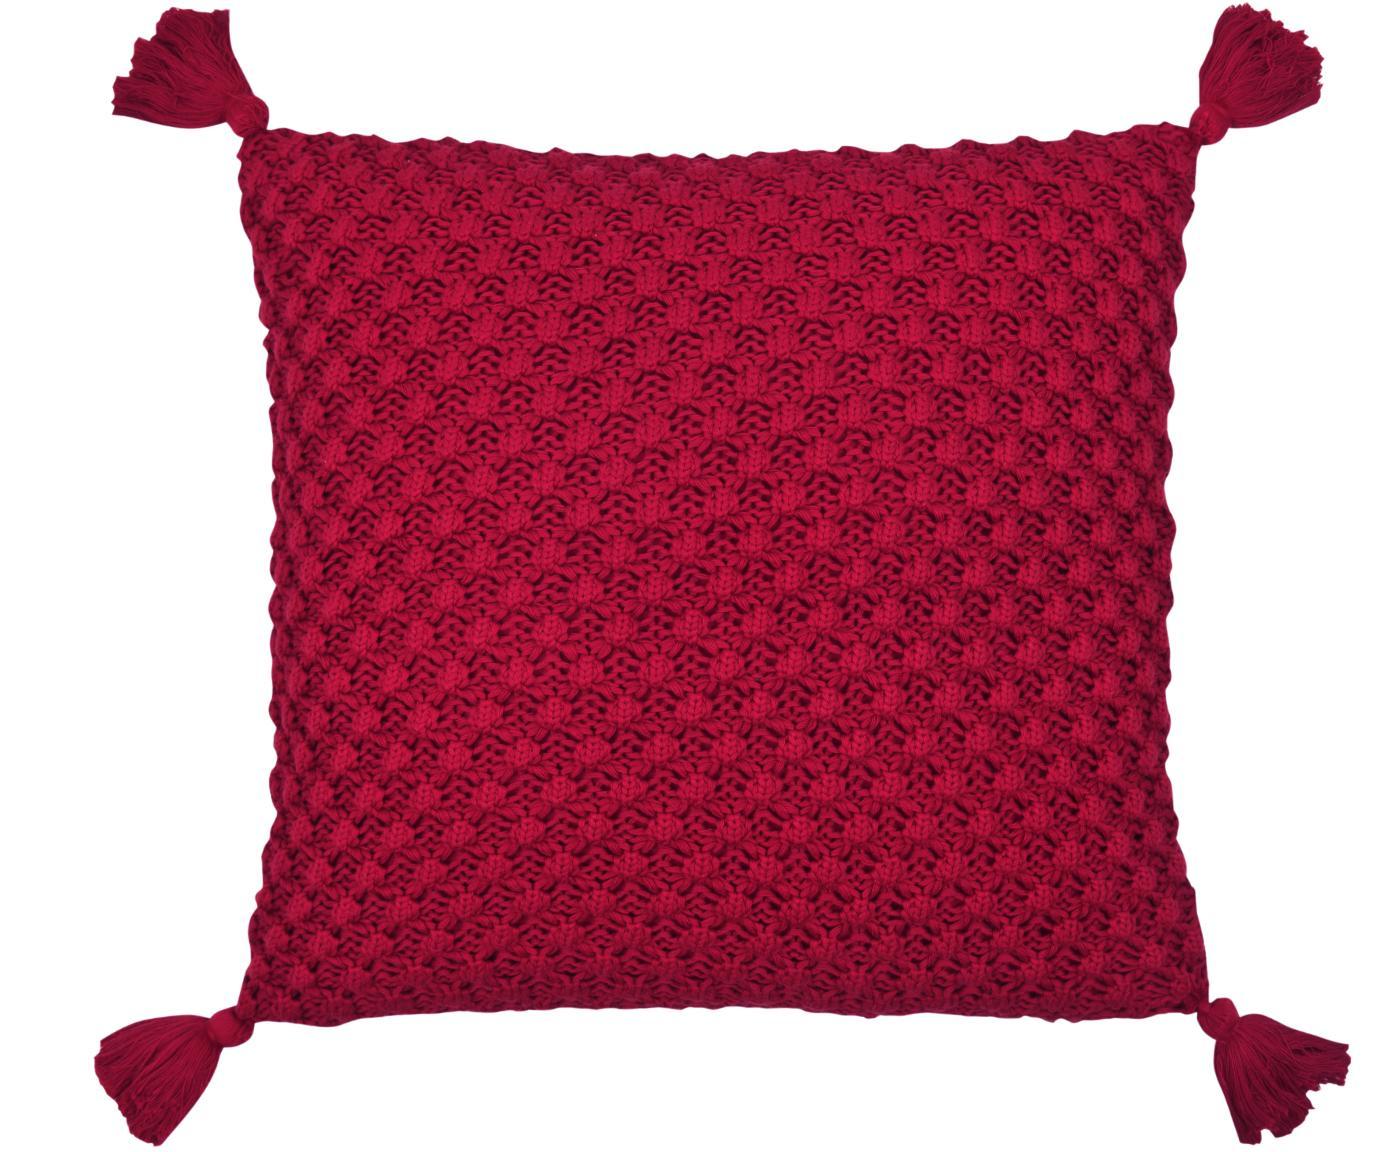 Gebreide kussenhoes Astrid, 100% katoen, Rood, 50 x 50 cm